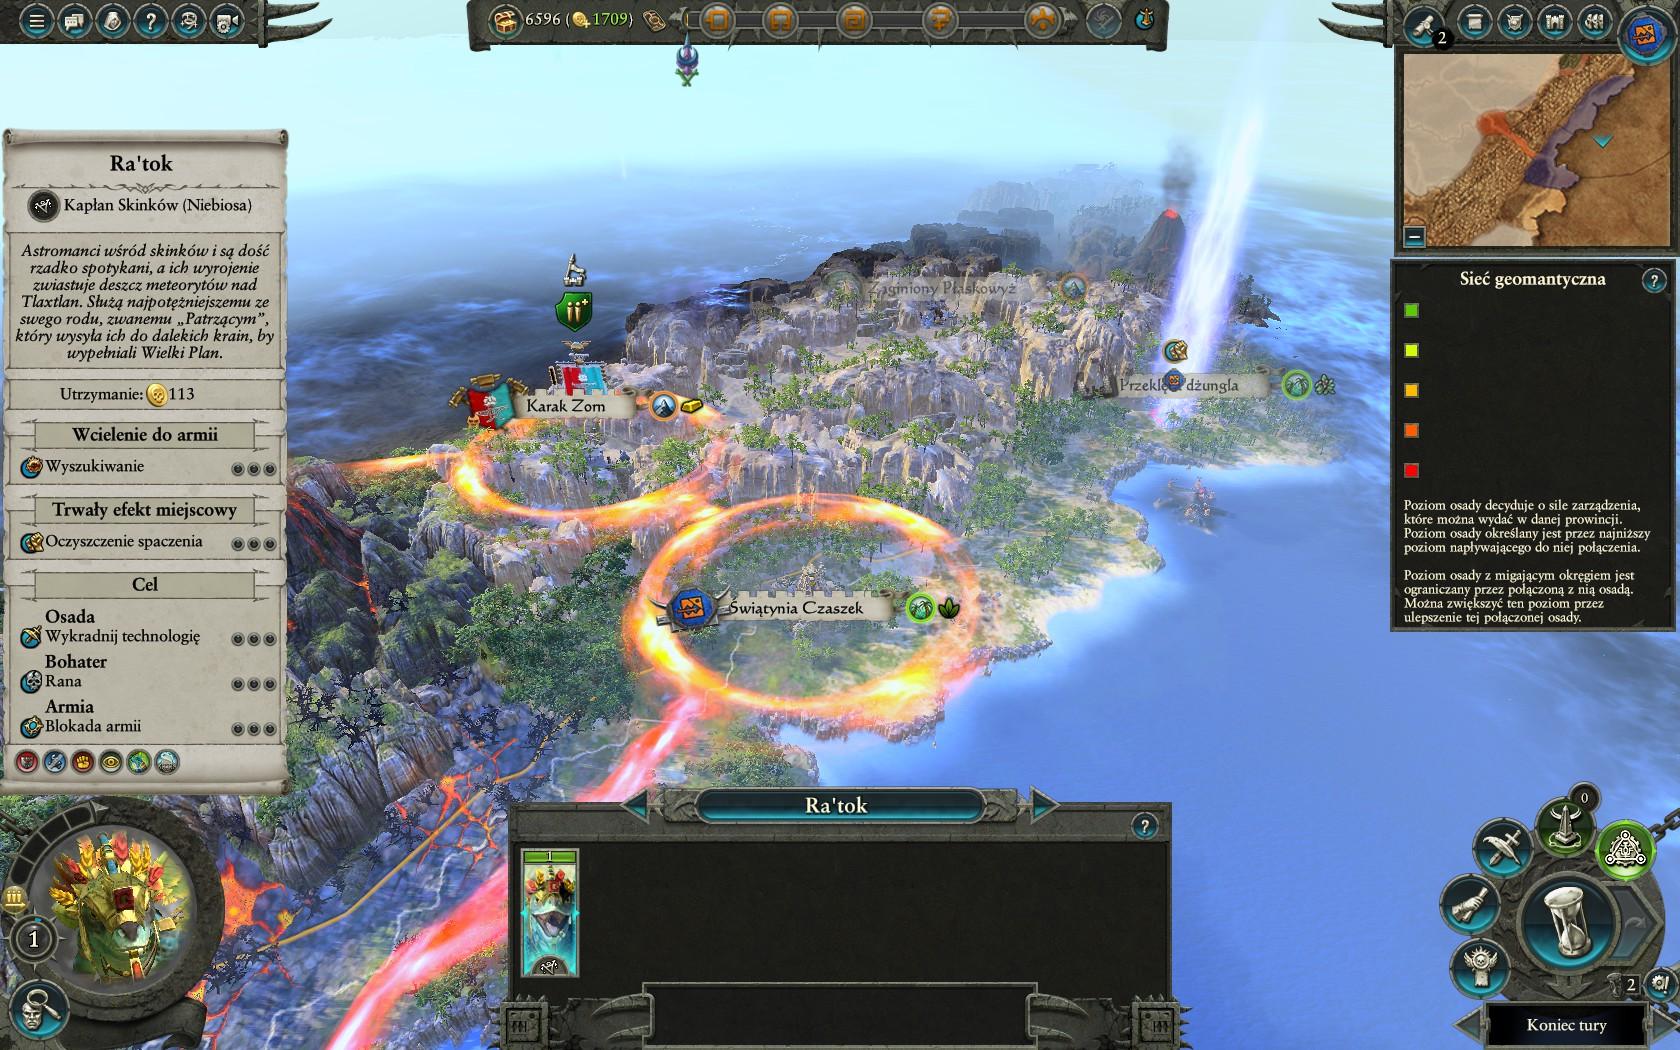 Total War: Warhammer II - Ra'tok